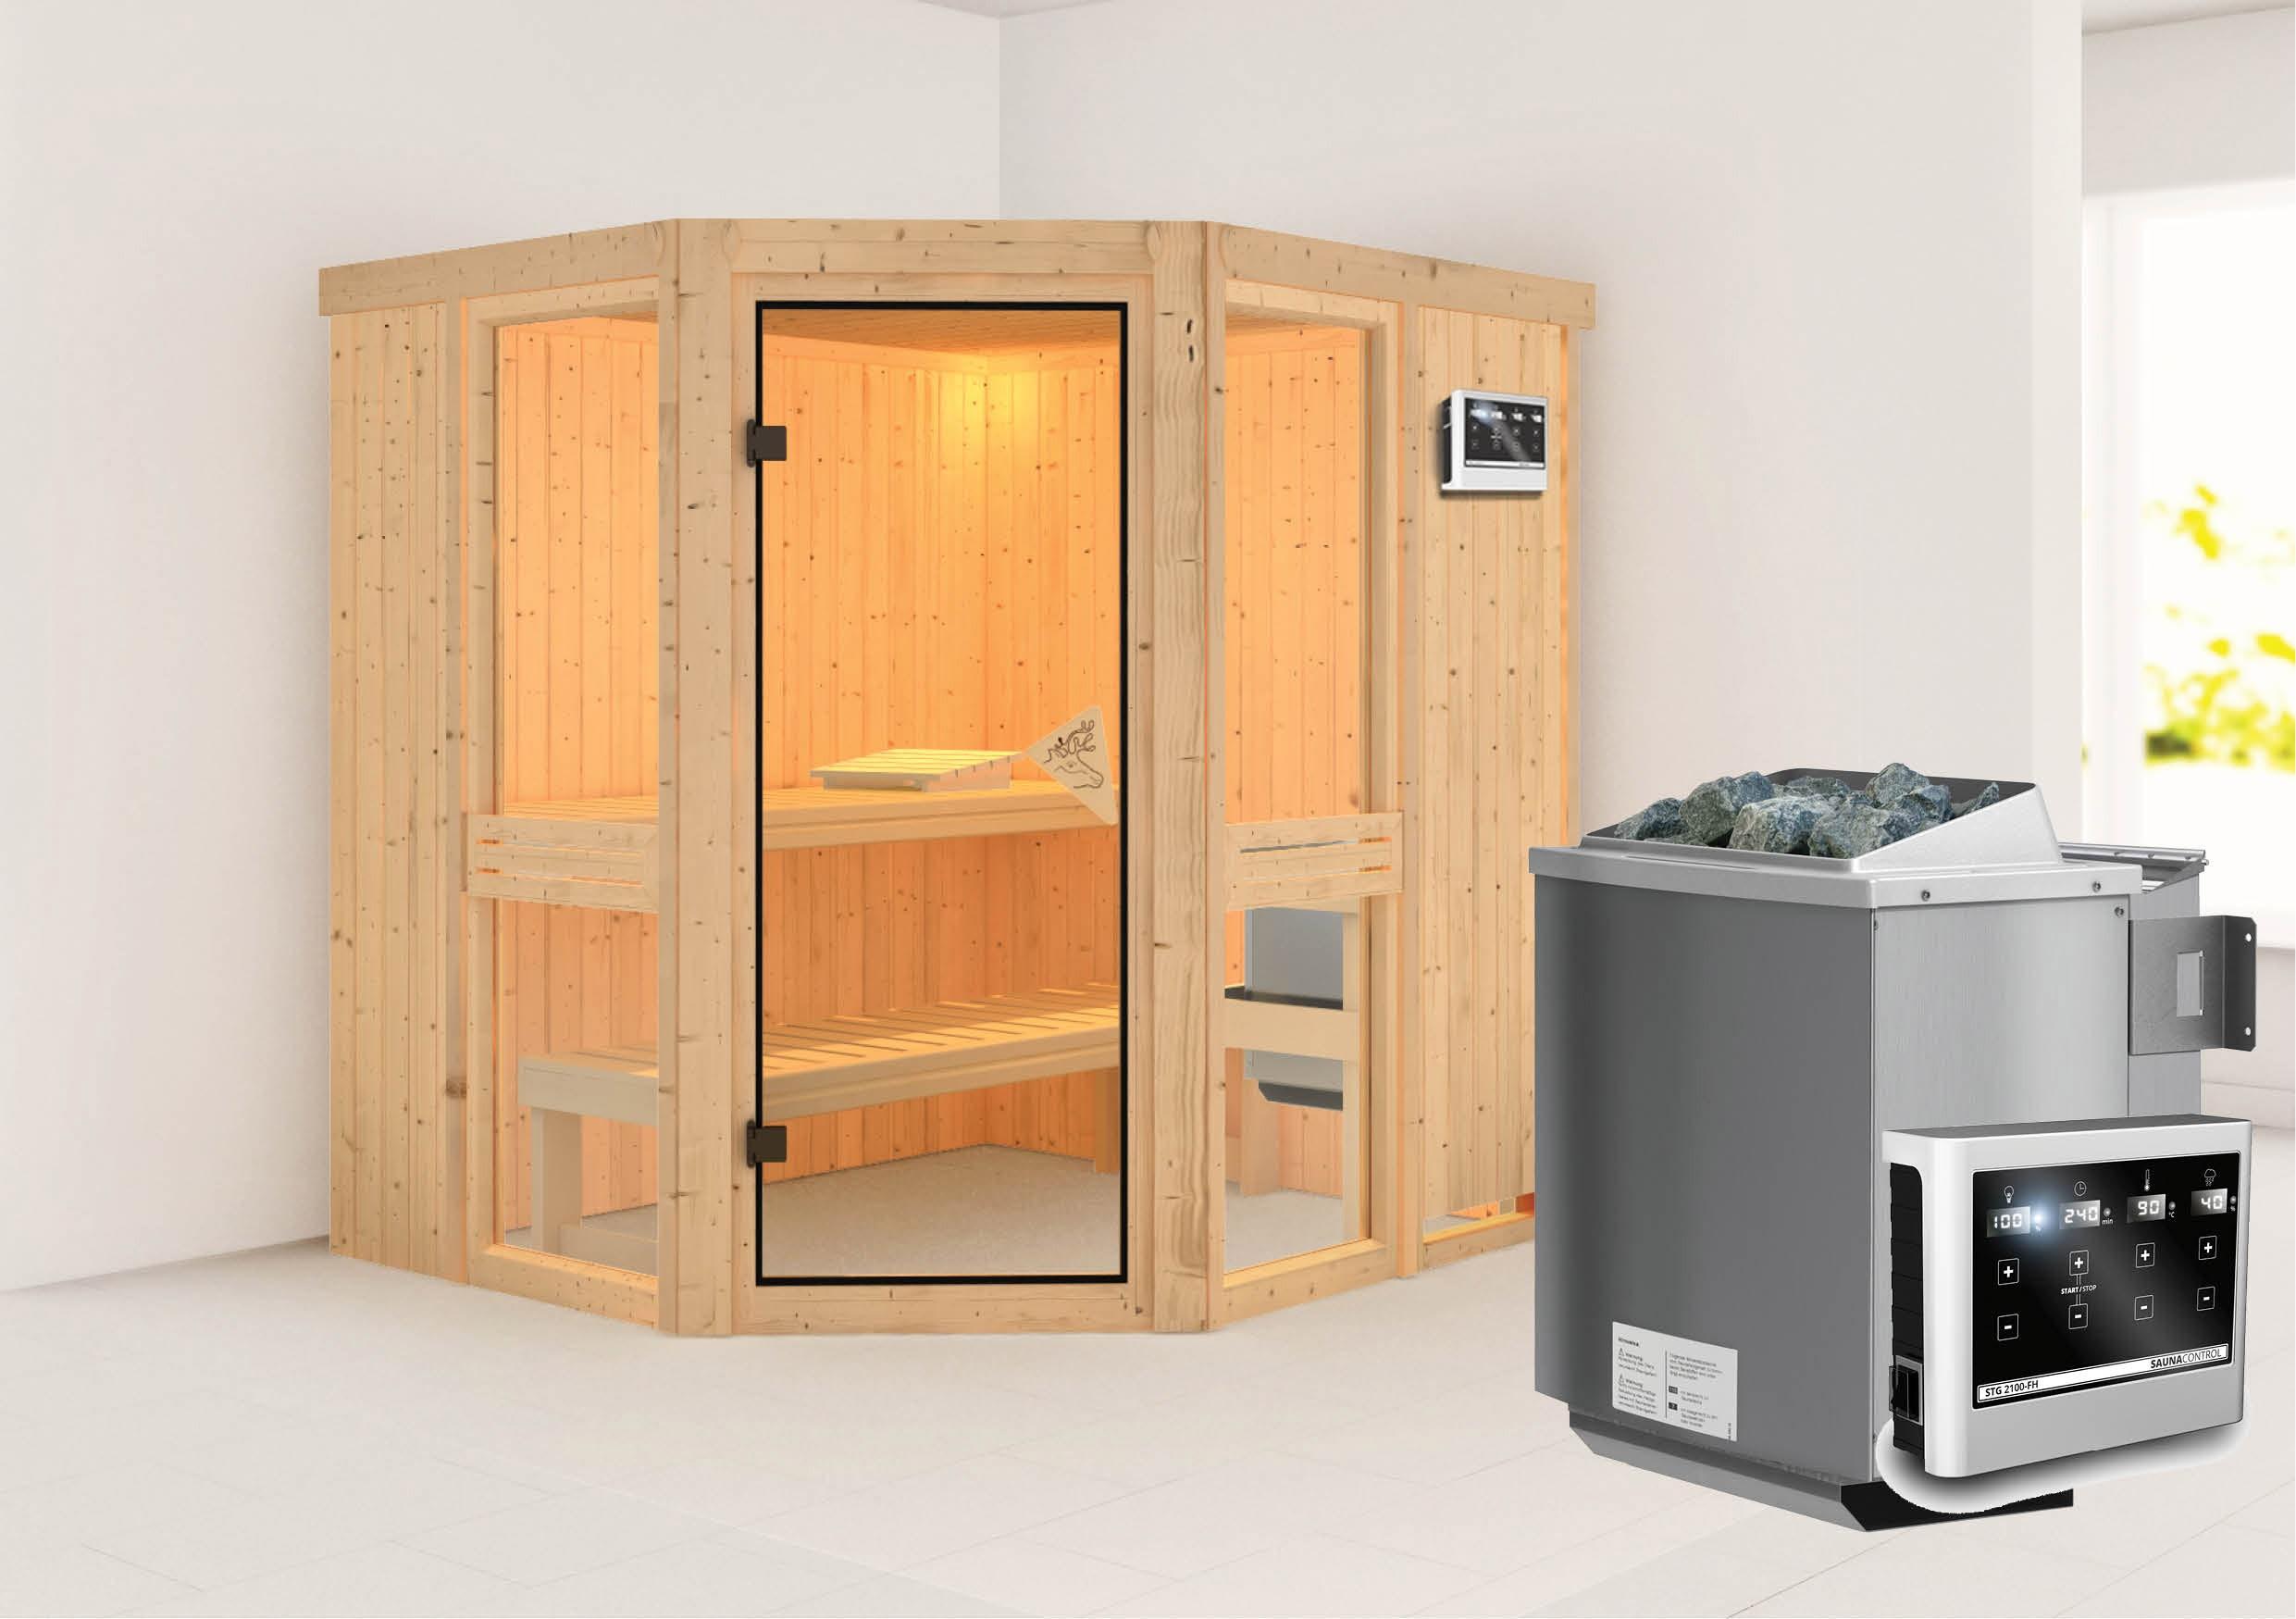 karibu sauna amelia1 68mm mit bio ofen 9kw extern classic t r bei. Black Bedroom Furniture Sets. Home Design Ideas